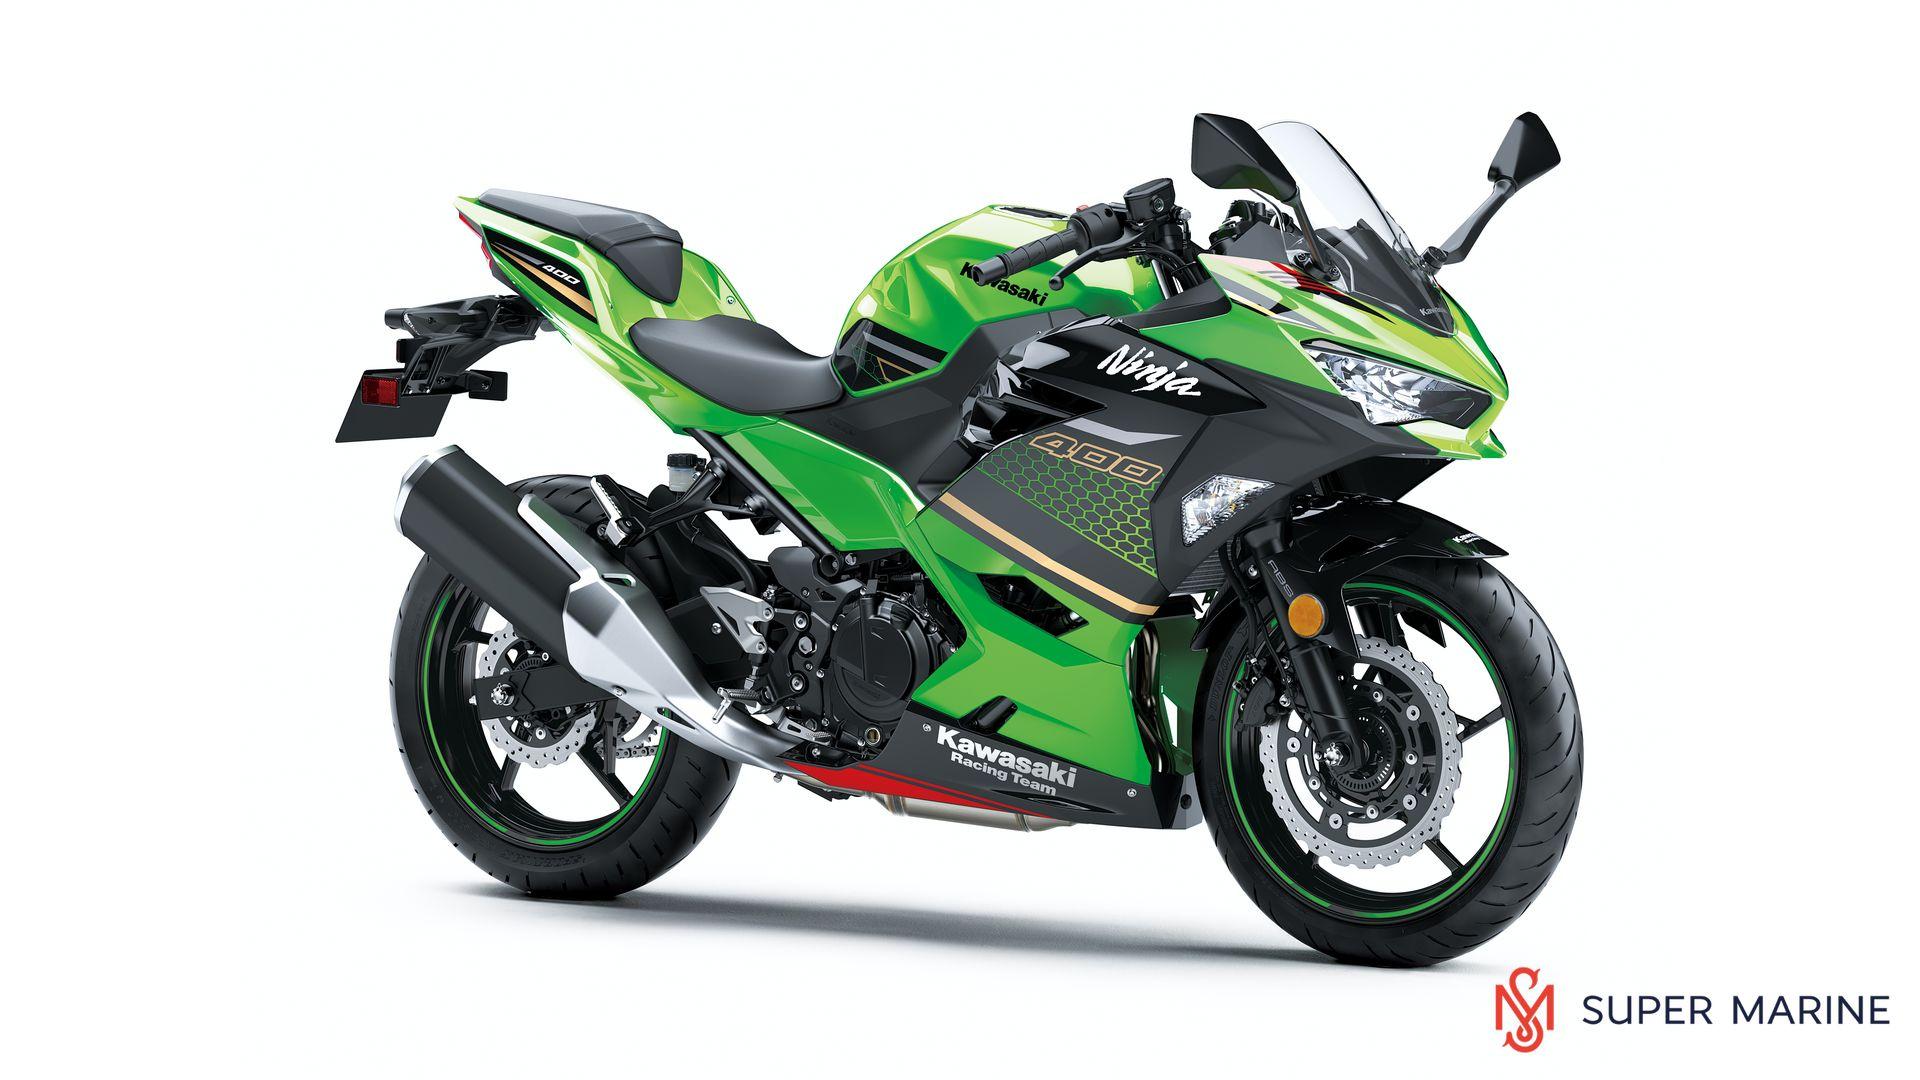 Мотоцикл Kawasaki Ninja 400 Зеленый 2020 - 1